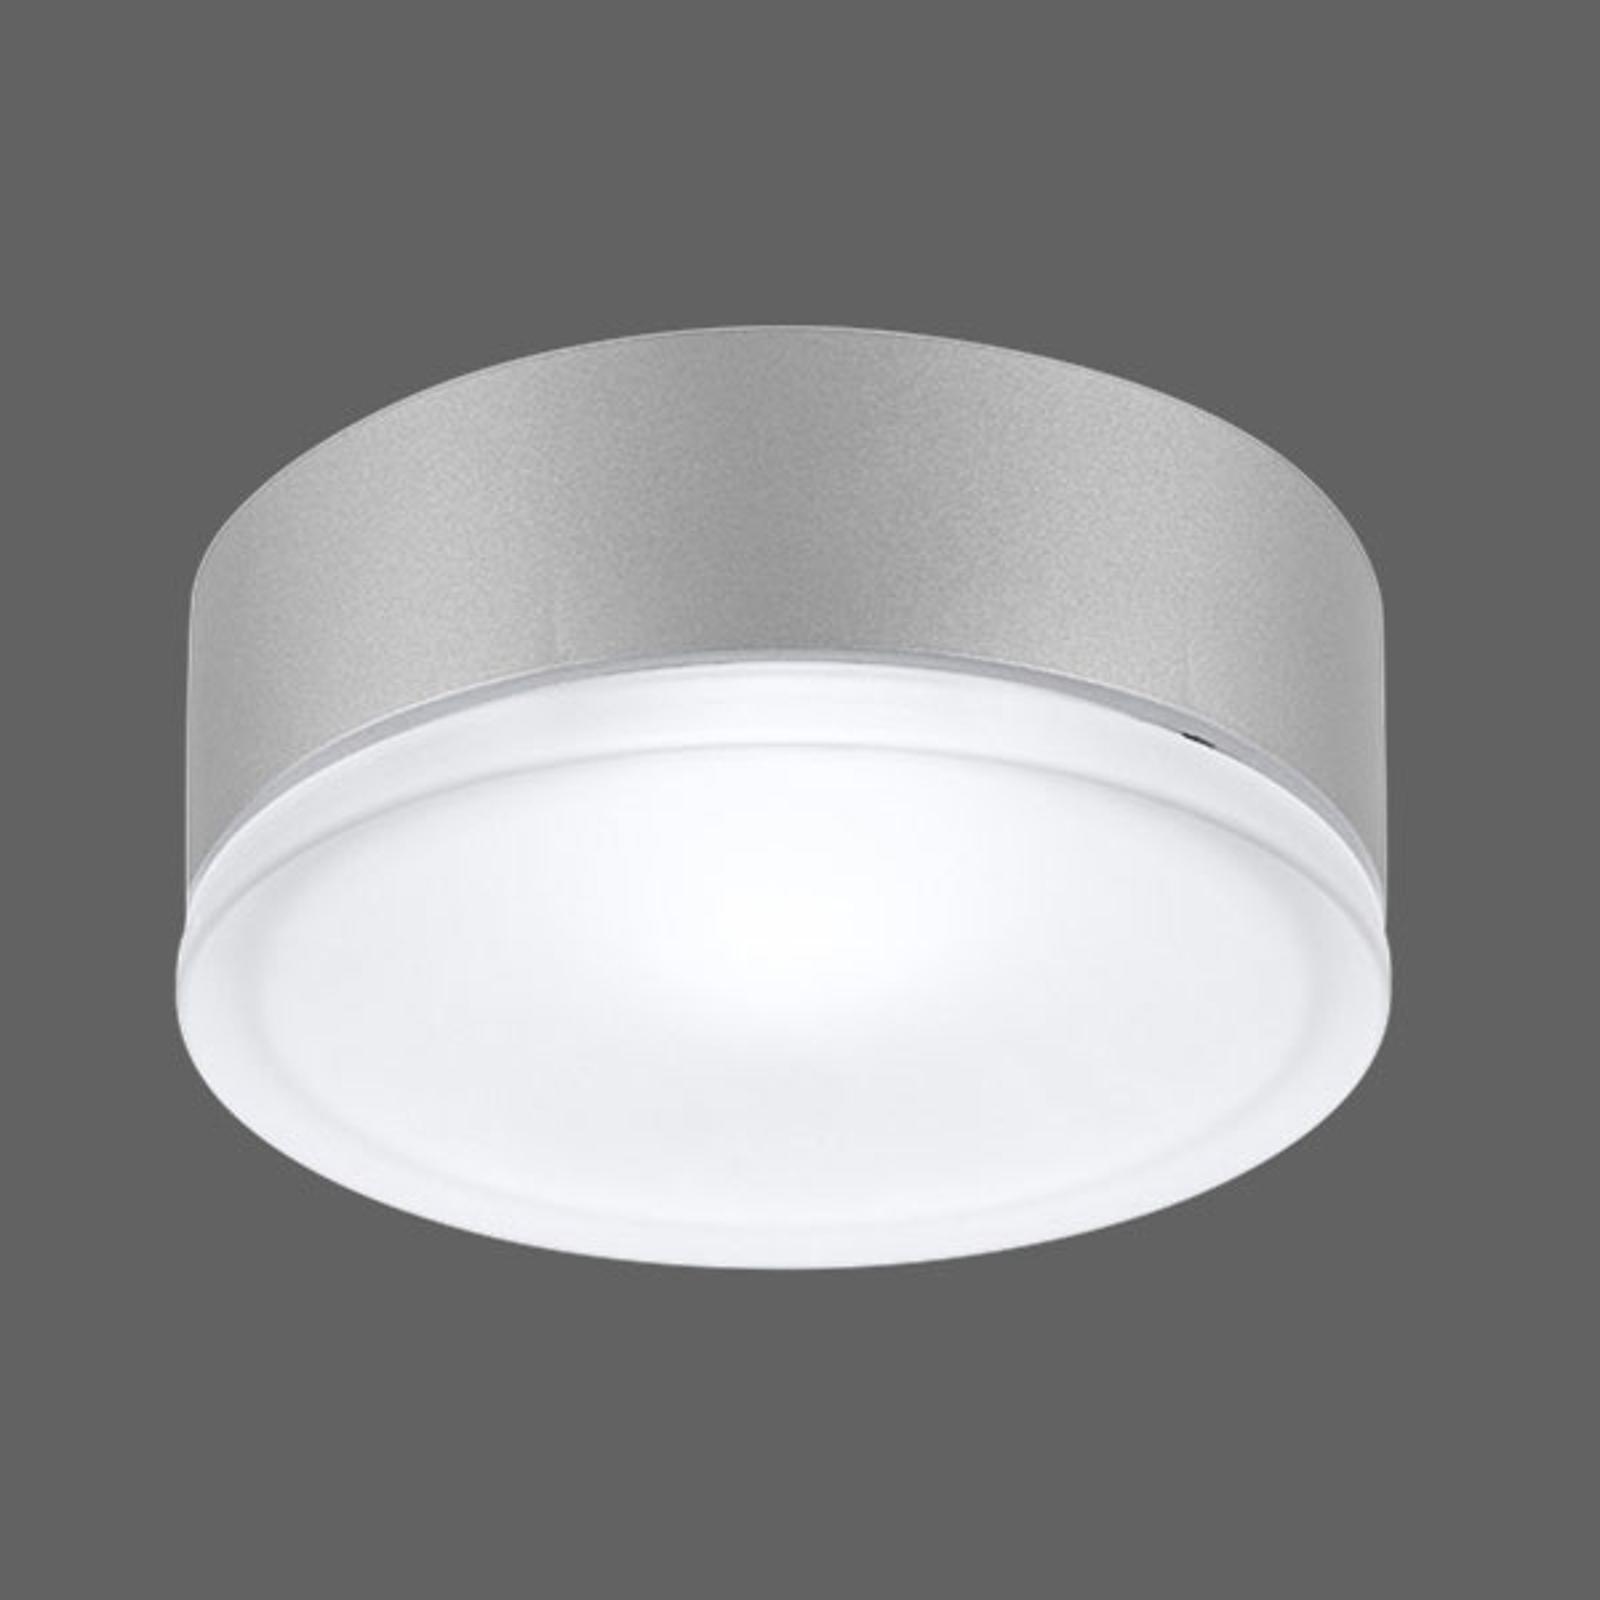 Drop 28 LED Außenwandleuchte in Grau 4.000K